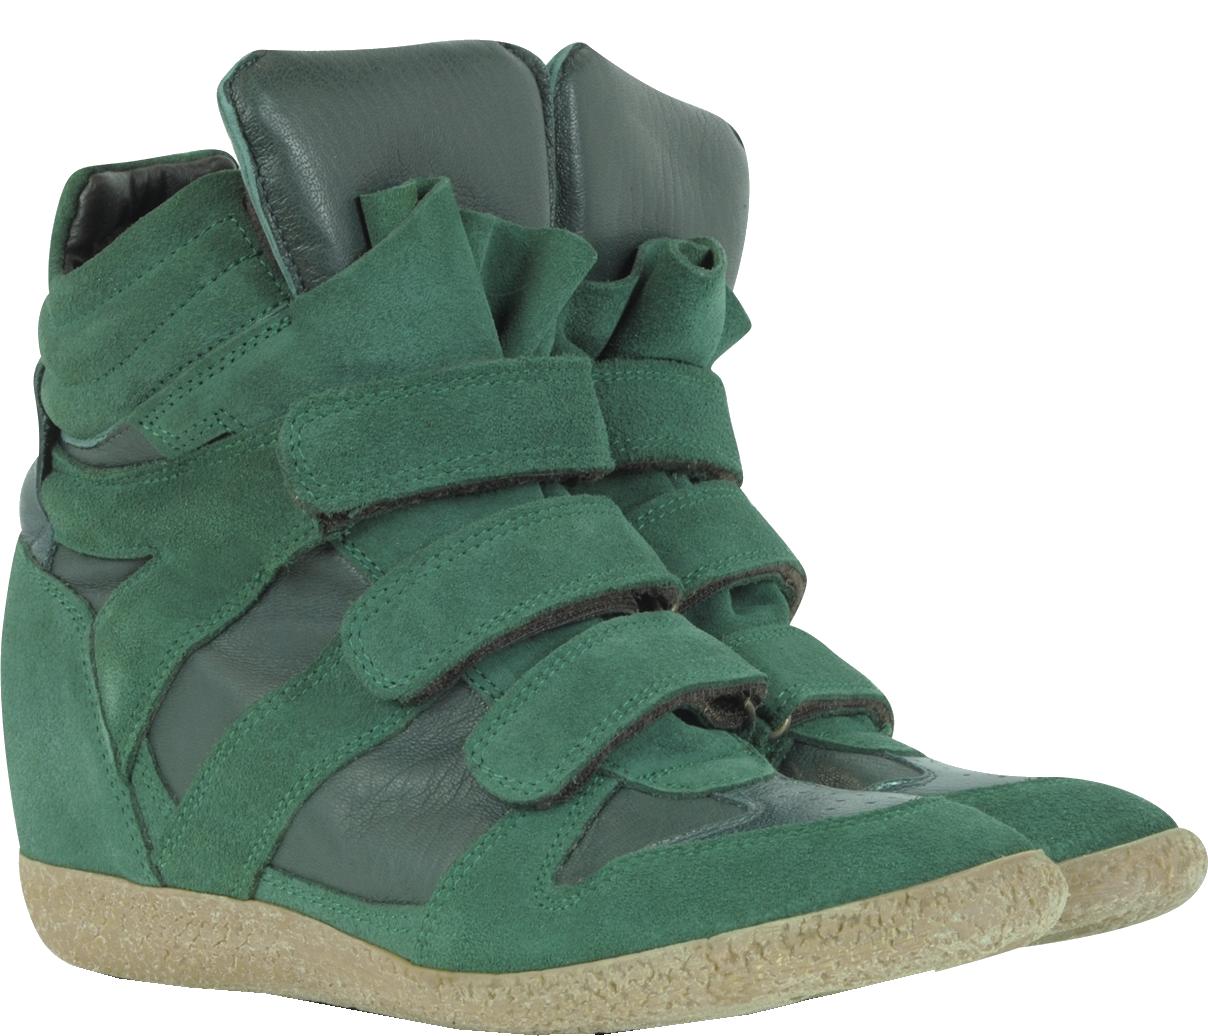 Lemare Dark Green Suede Wedge Sneaker